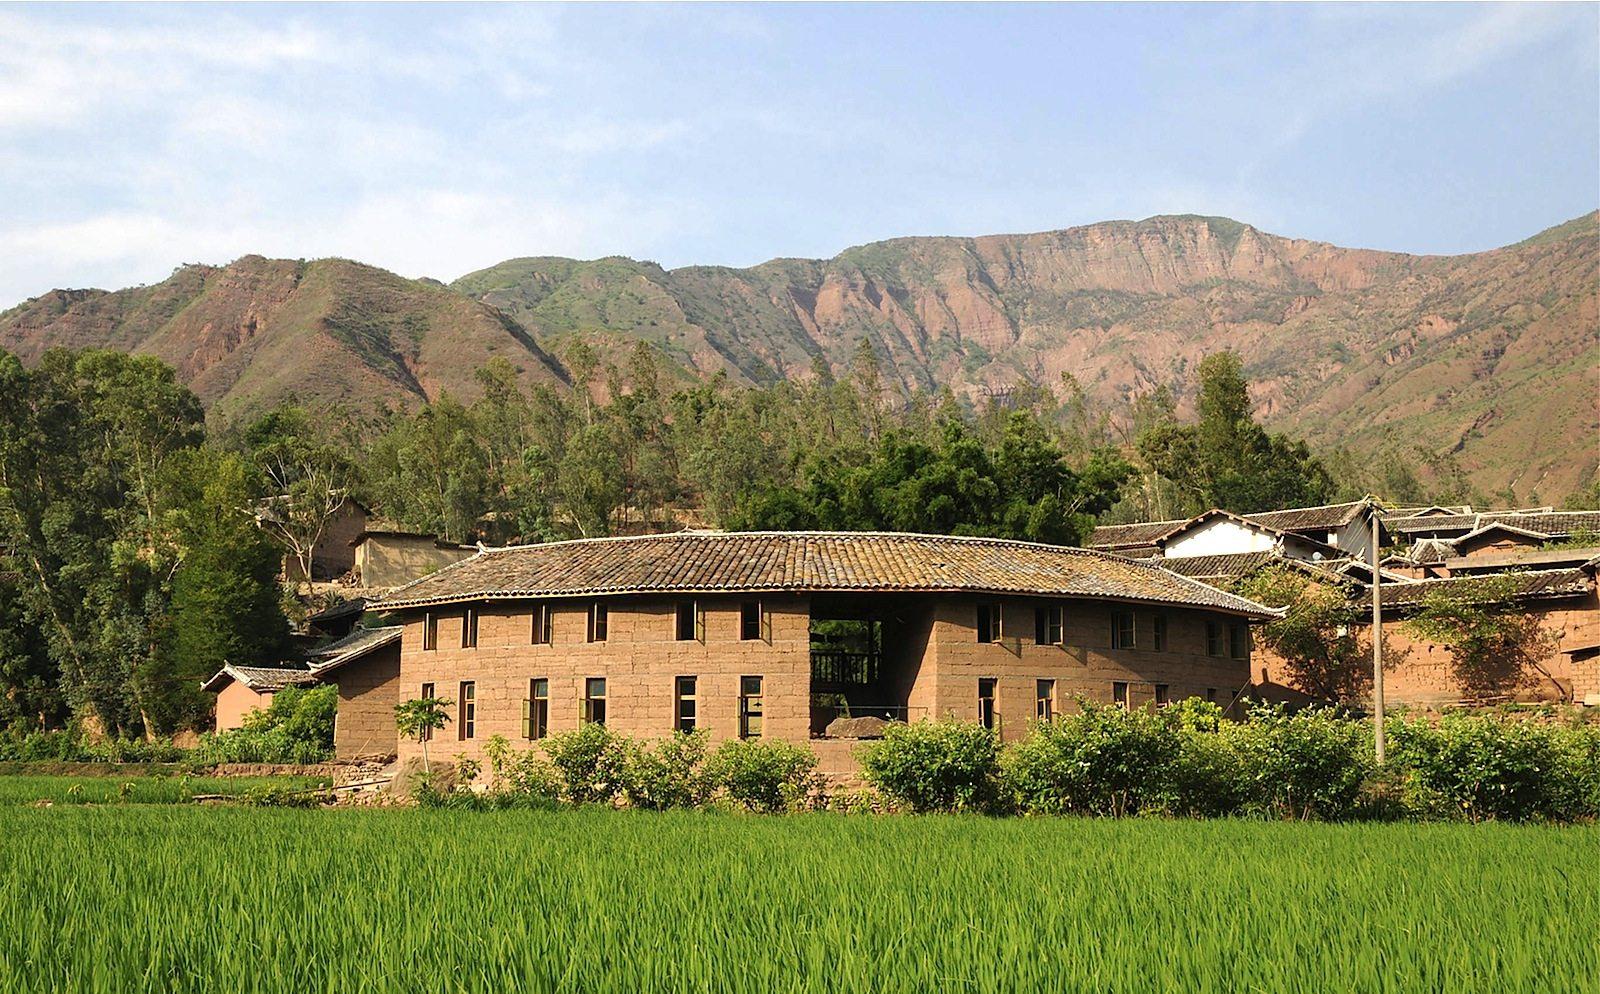 Wiederaufbau eines vom Erdbeben zerstörten Dorfes.  In Ma'anqiao, China, von Mu Jun, Edward Ng, Zhou Tiegang, Wan Li, Ma Jie